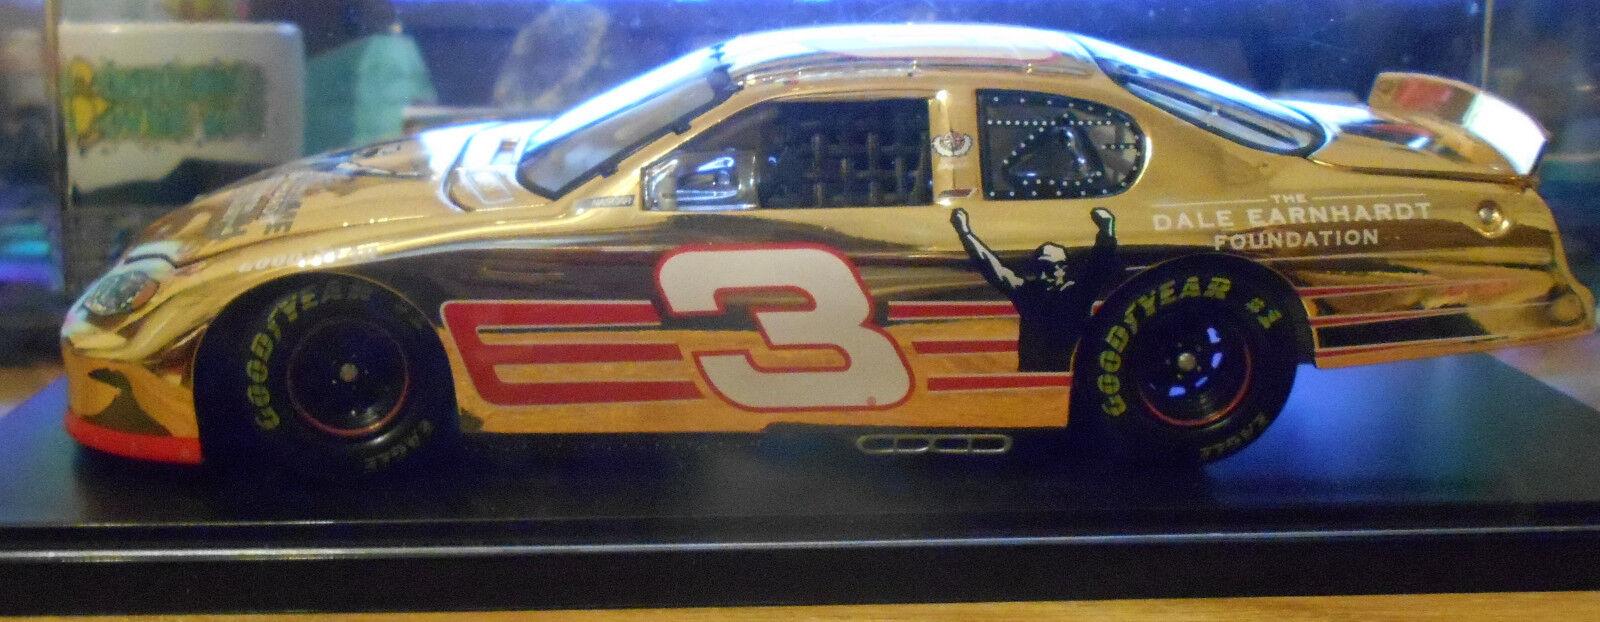 DALE EARNHARDT 24KT Gold 2003 Monte Carlo 1 24 Scale Diecast  Car